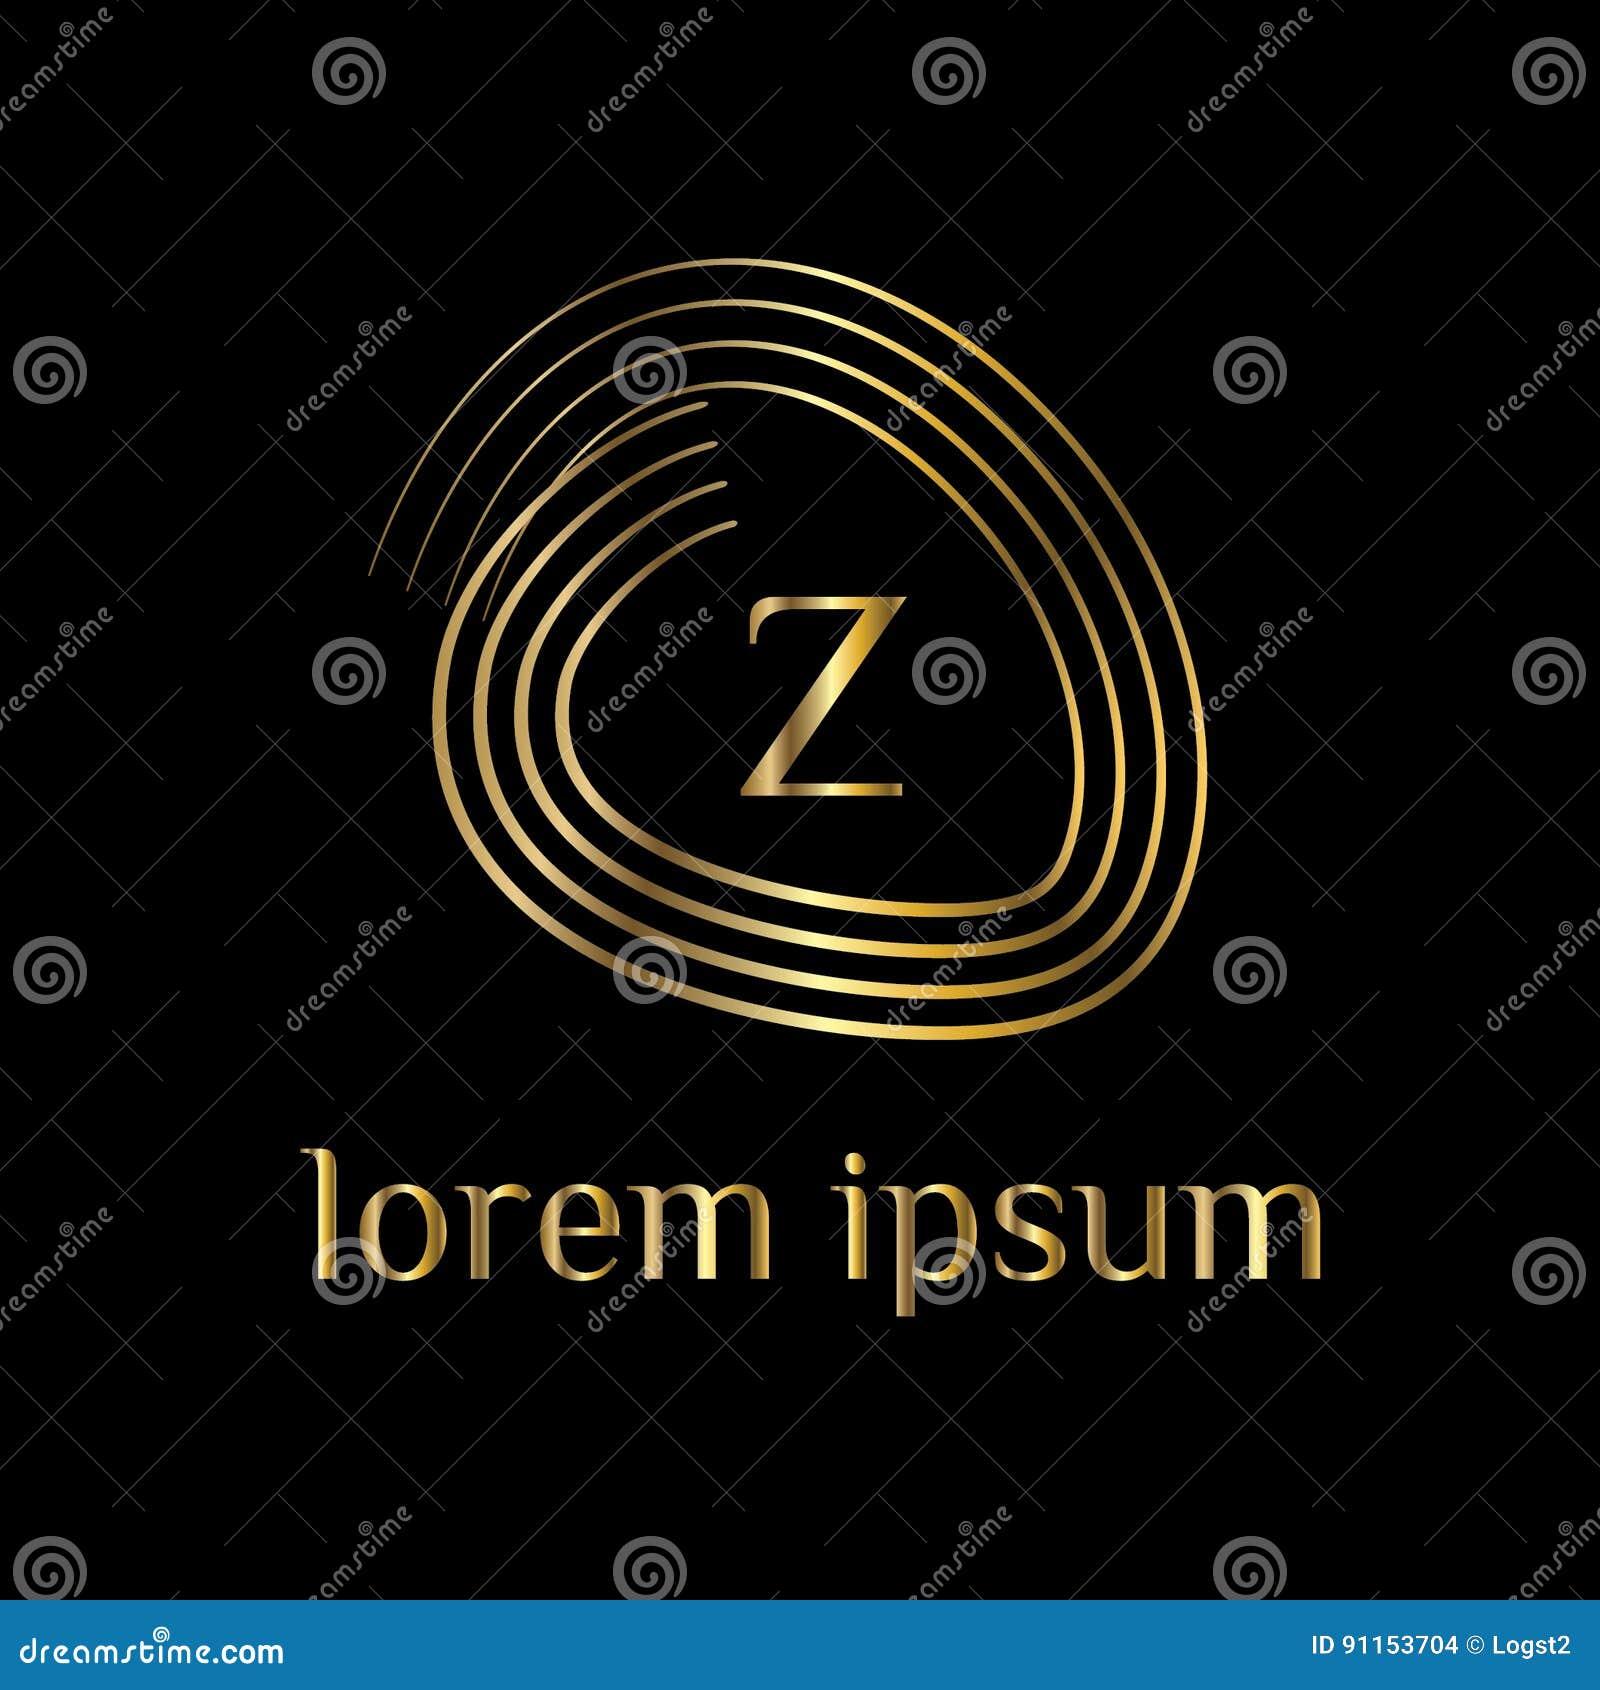 Look - Logo stylish download video